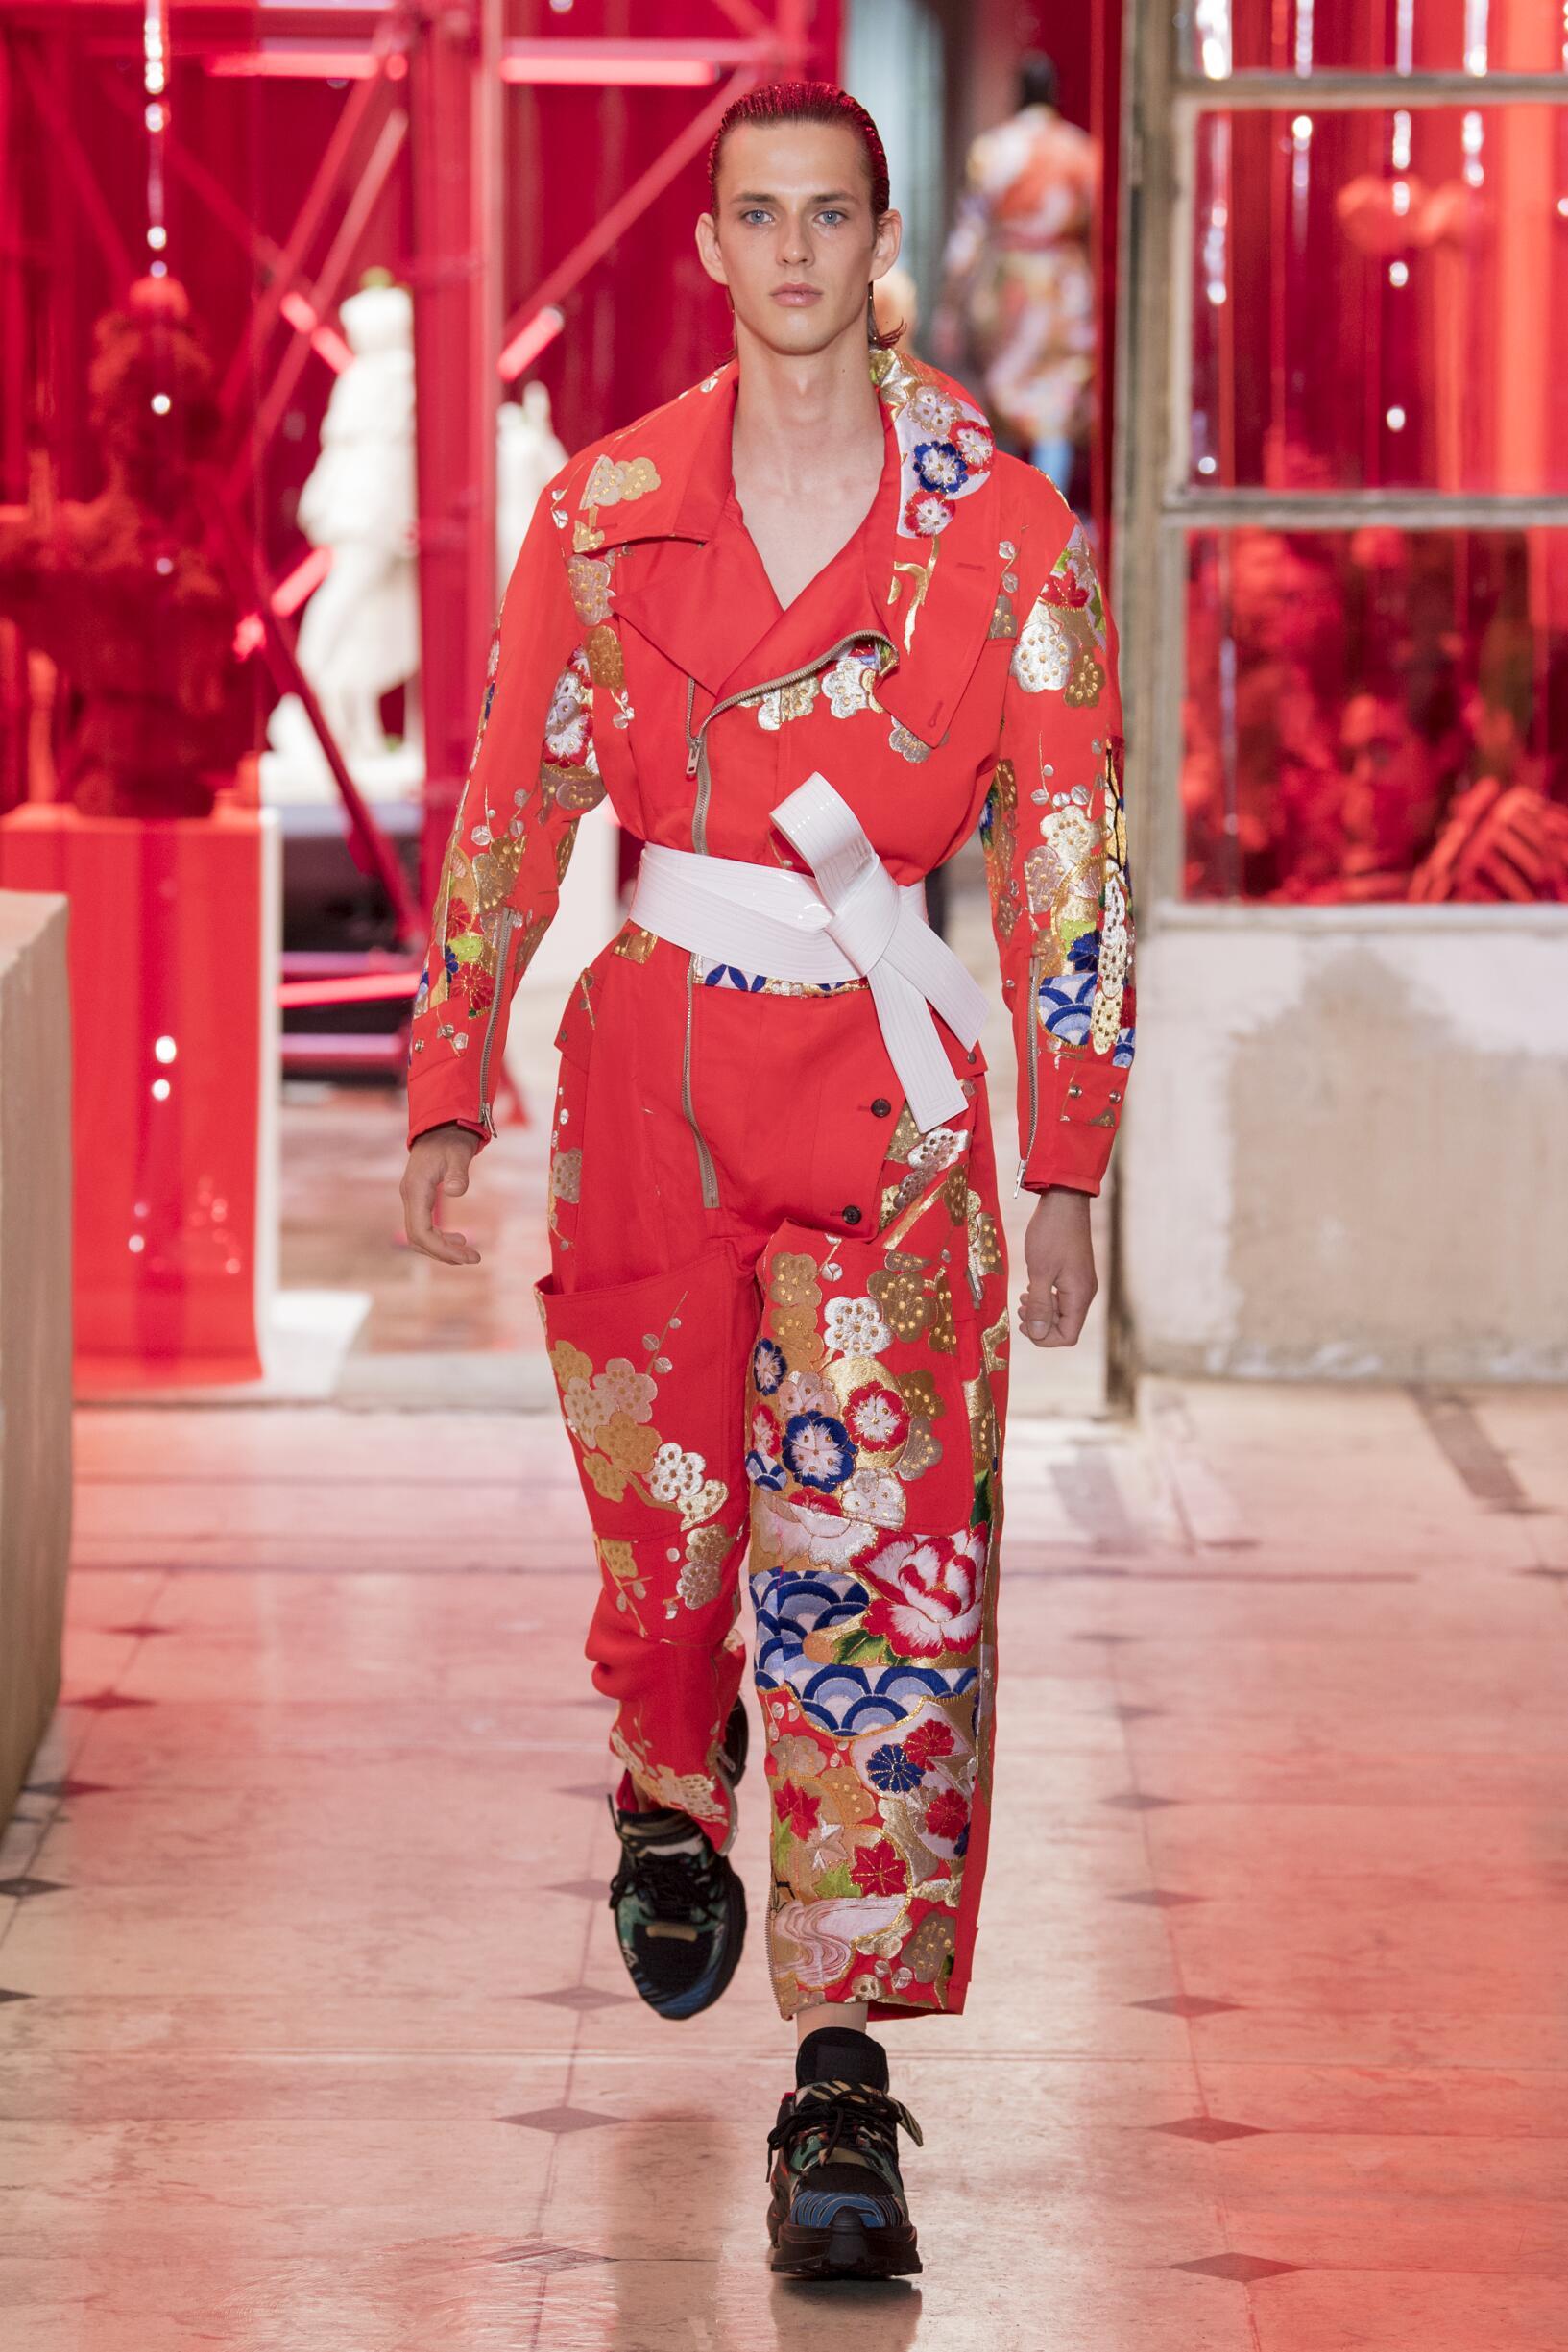 Fashion Man Model Maison Margiela Catwalk